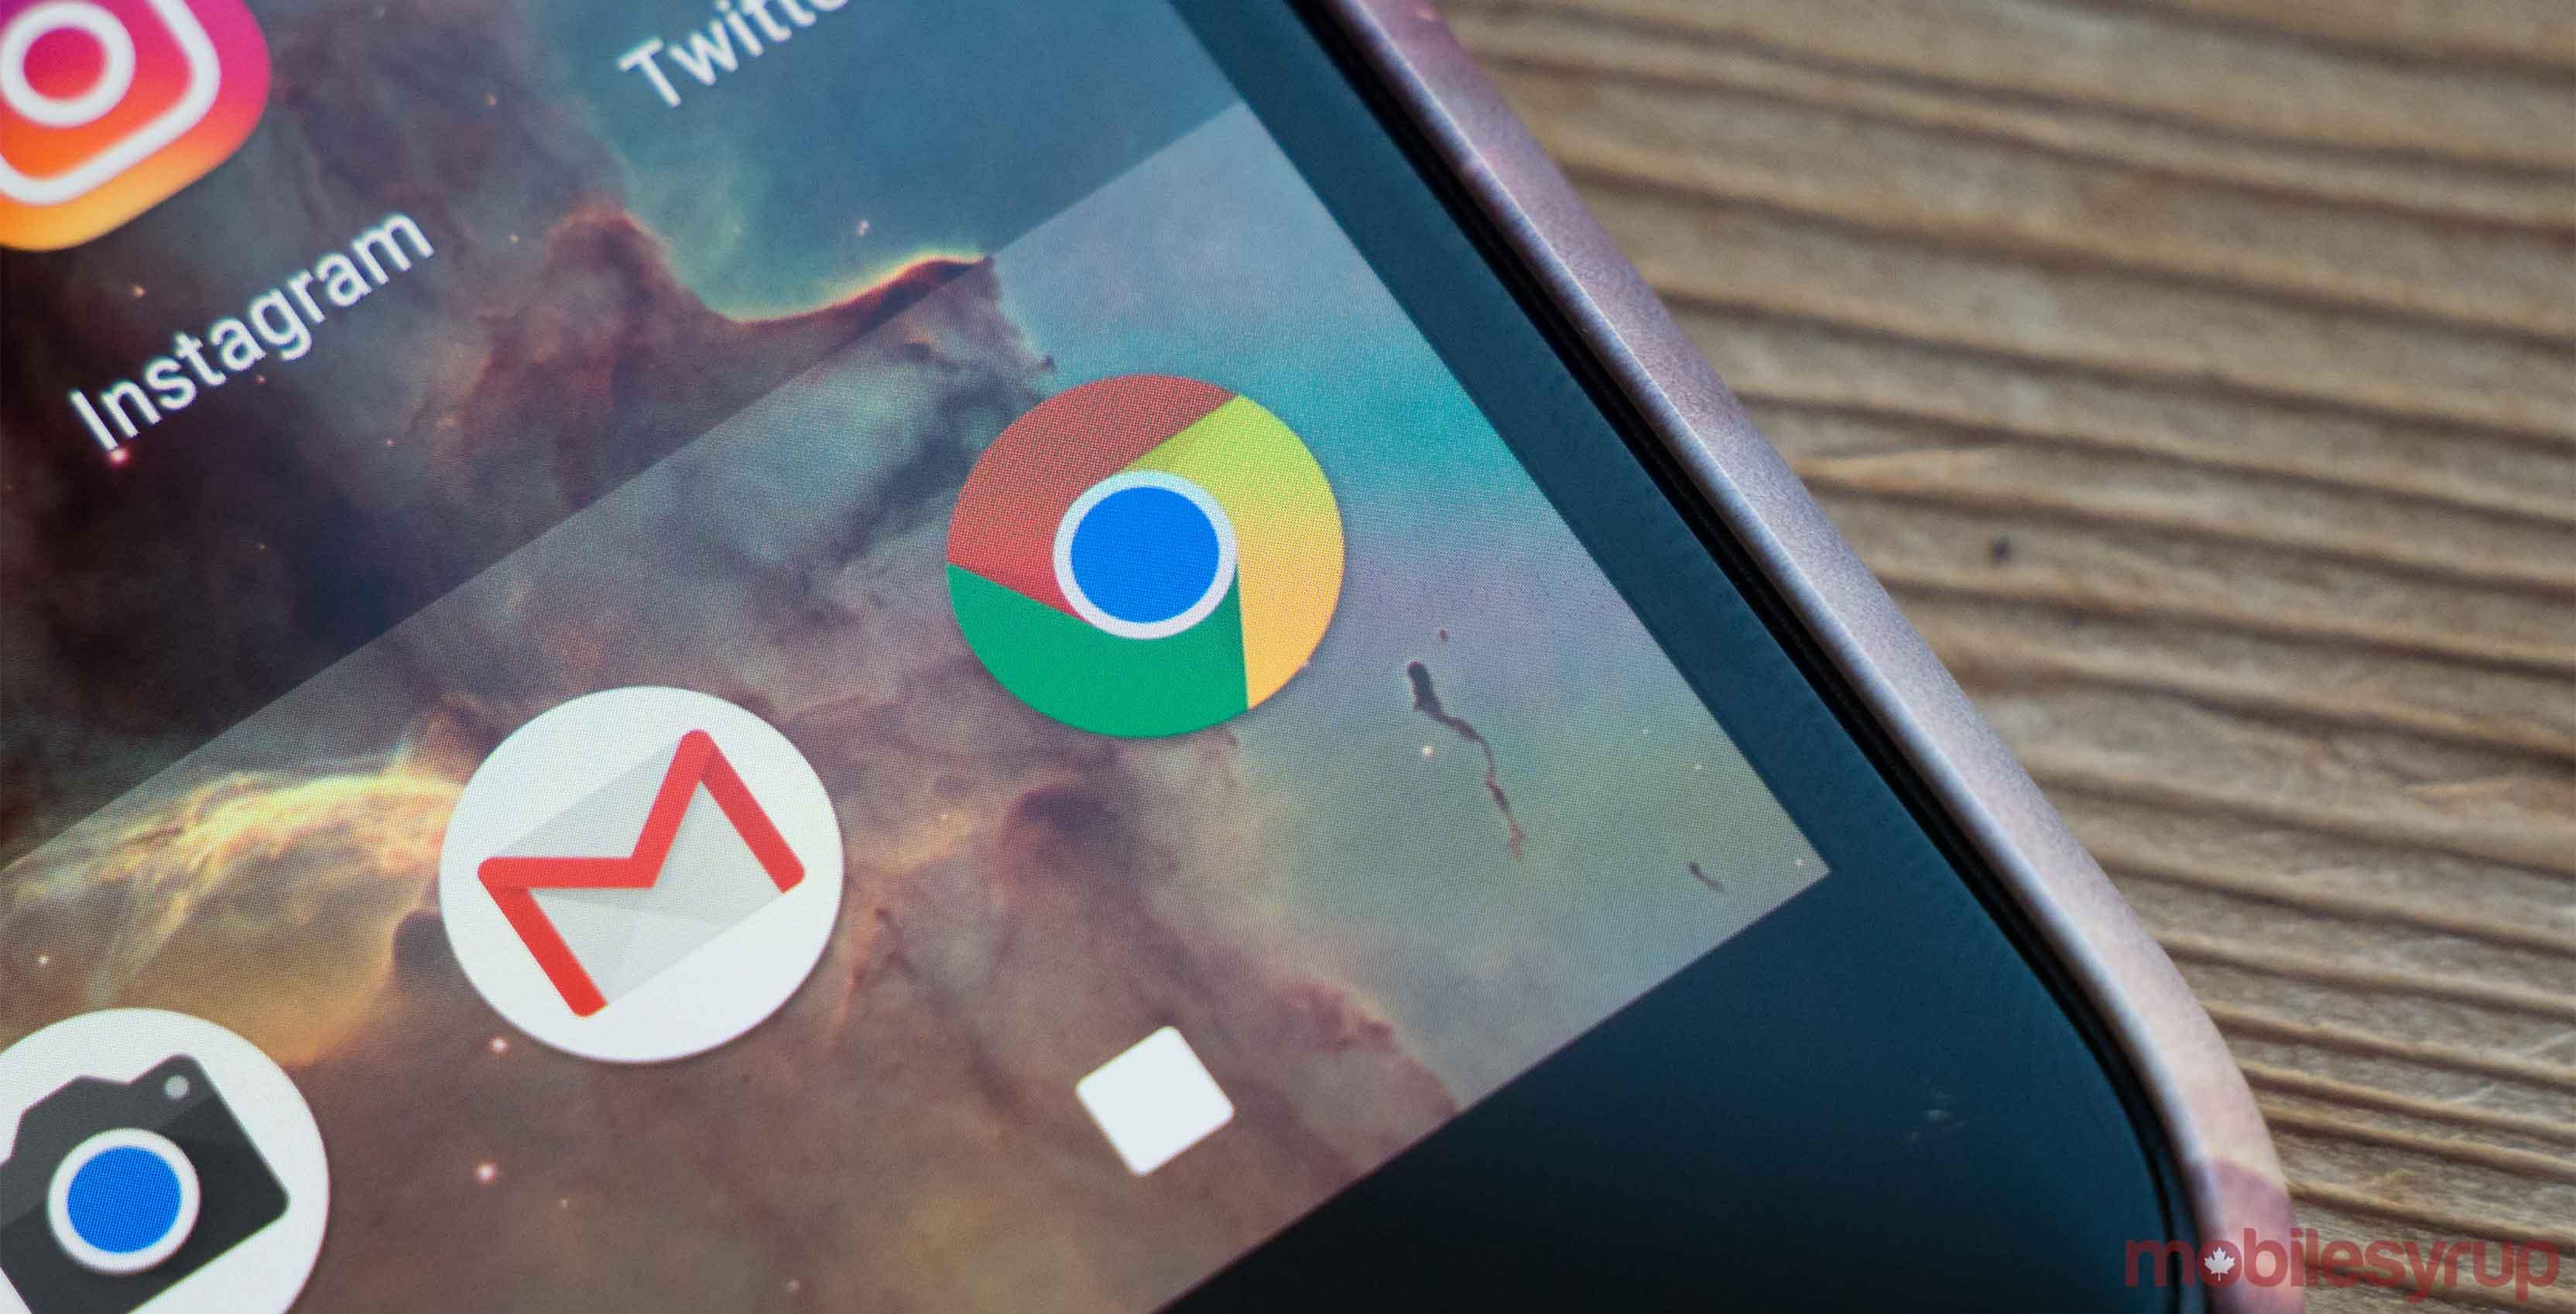 Google Chrome on smartphone - Chrome power usage